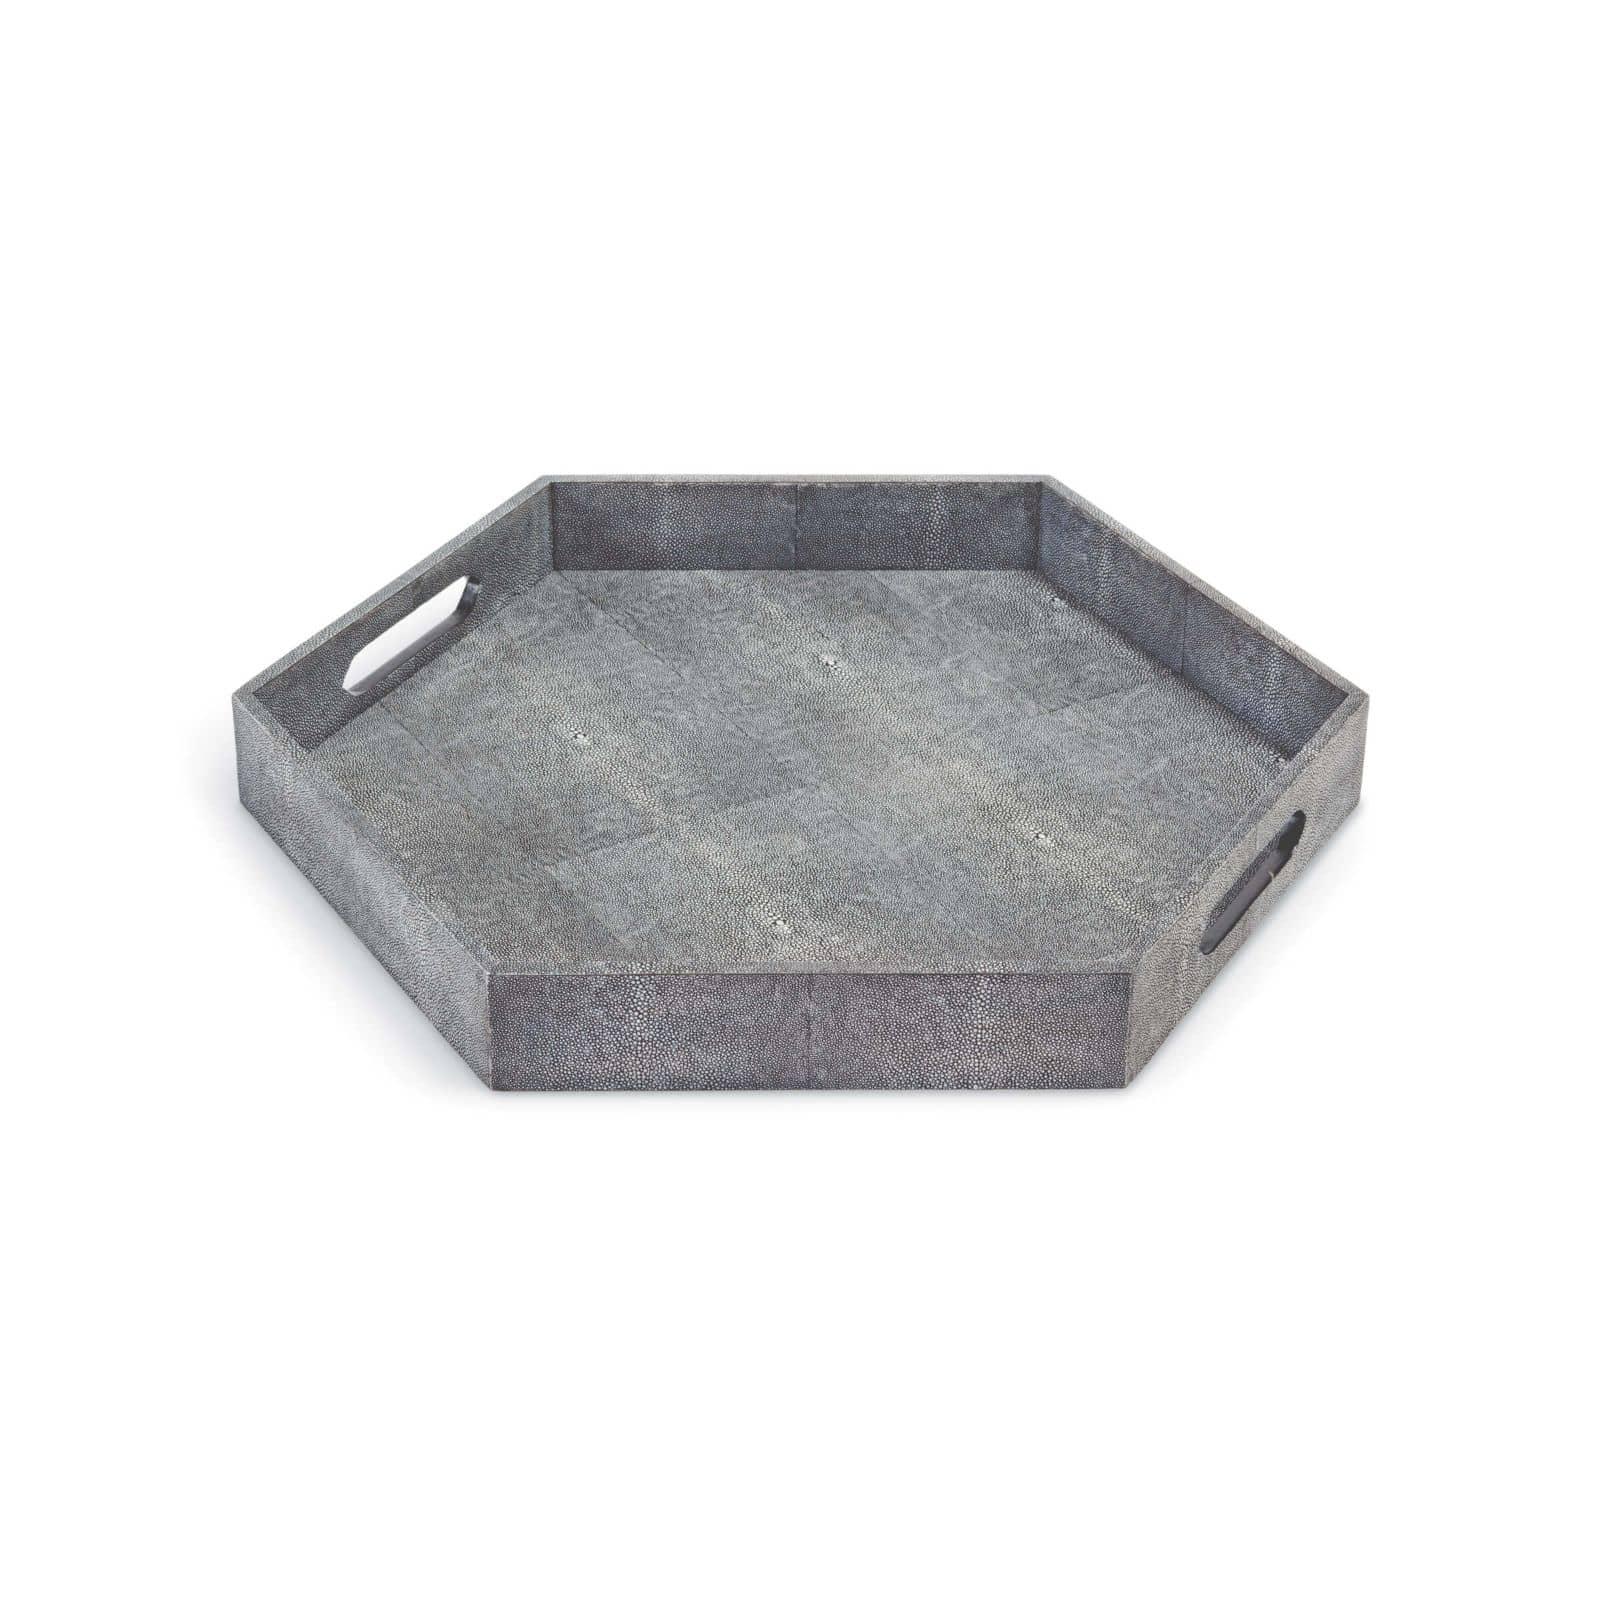 Shagreen Hex Tray Charcoal | Regina Andrew